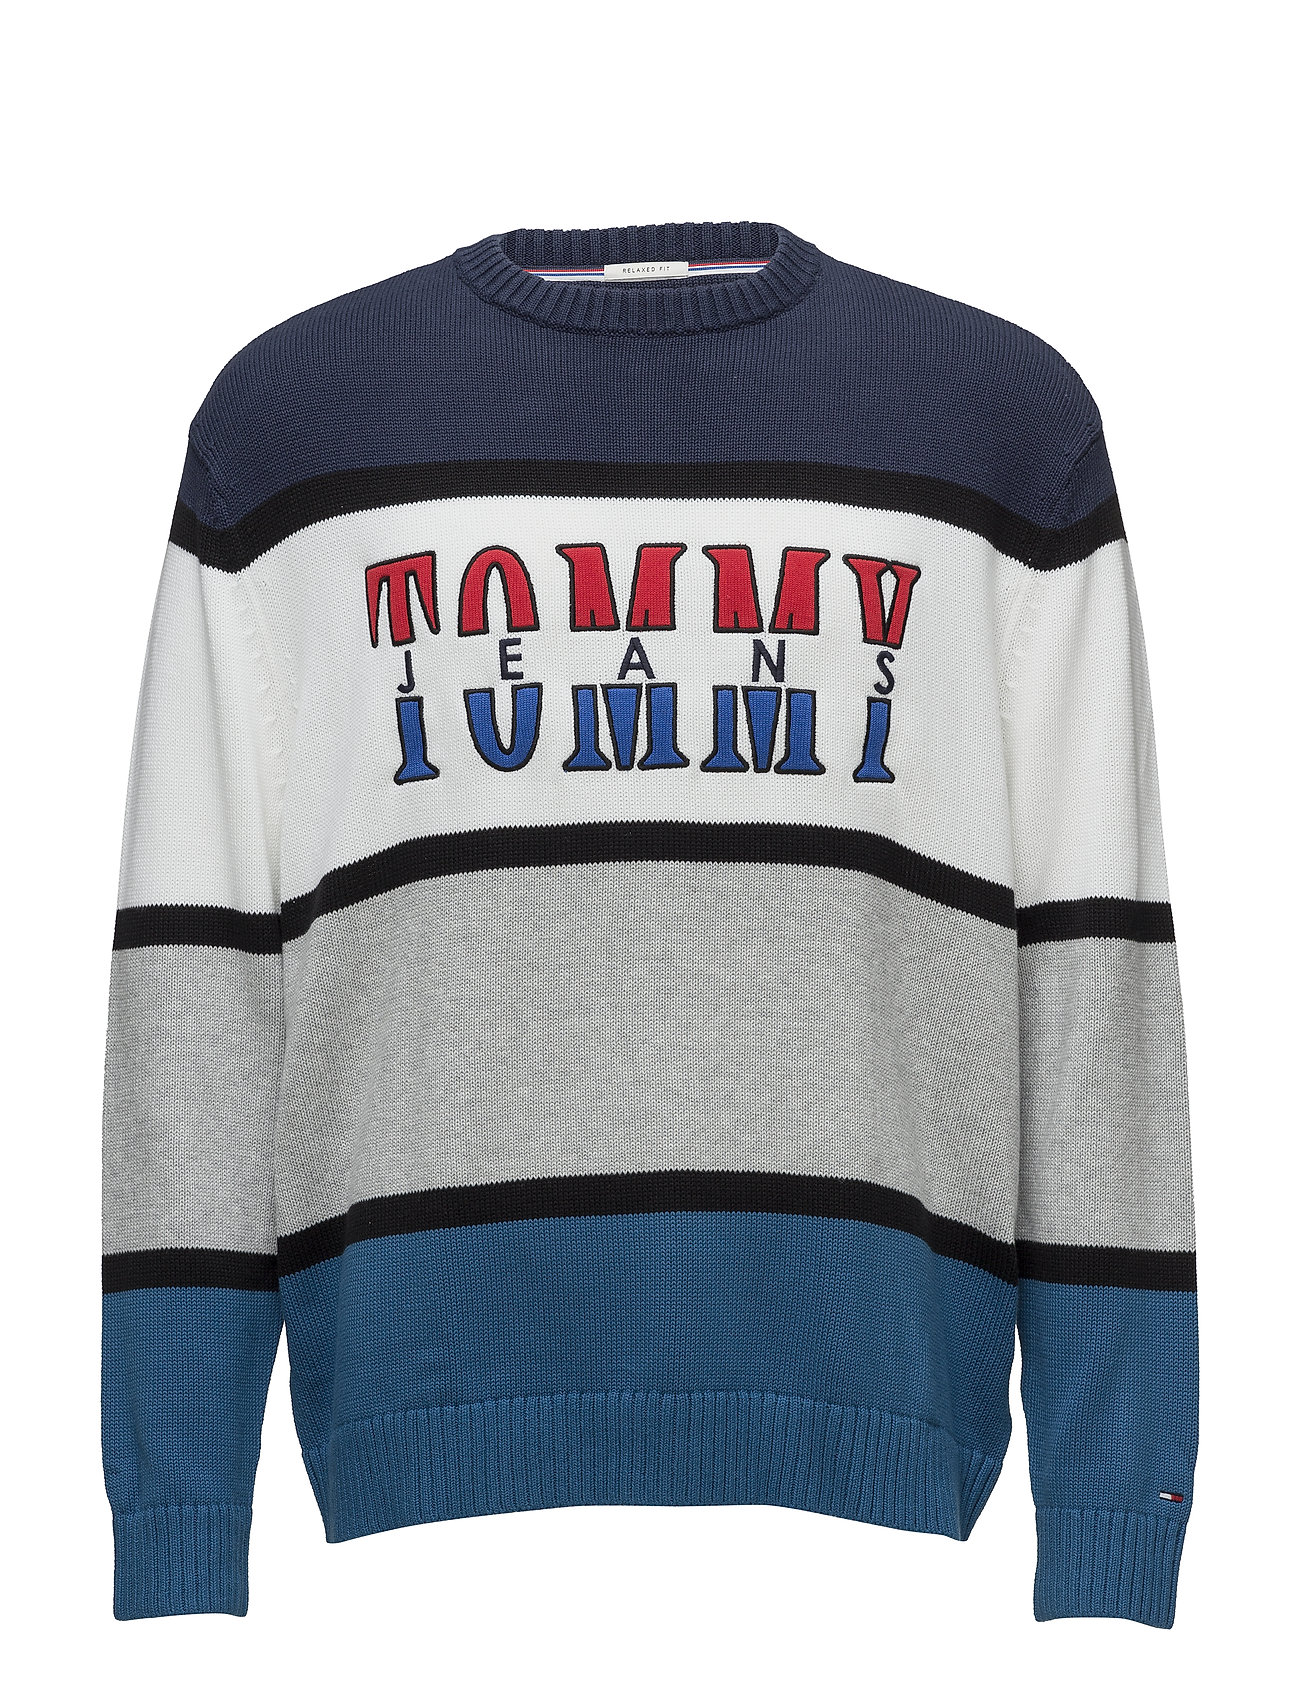 Tommy Jeans TJM RETRO COLORBLOCK SWEATER